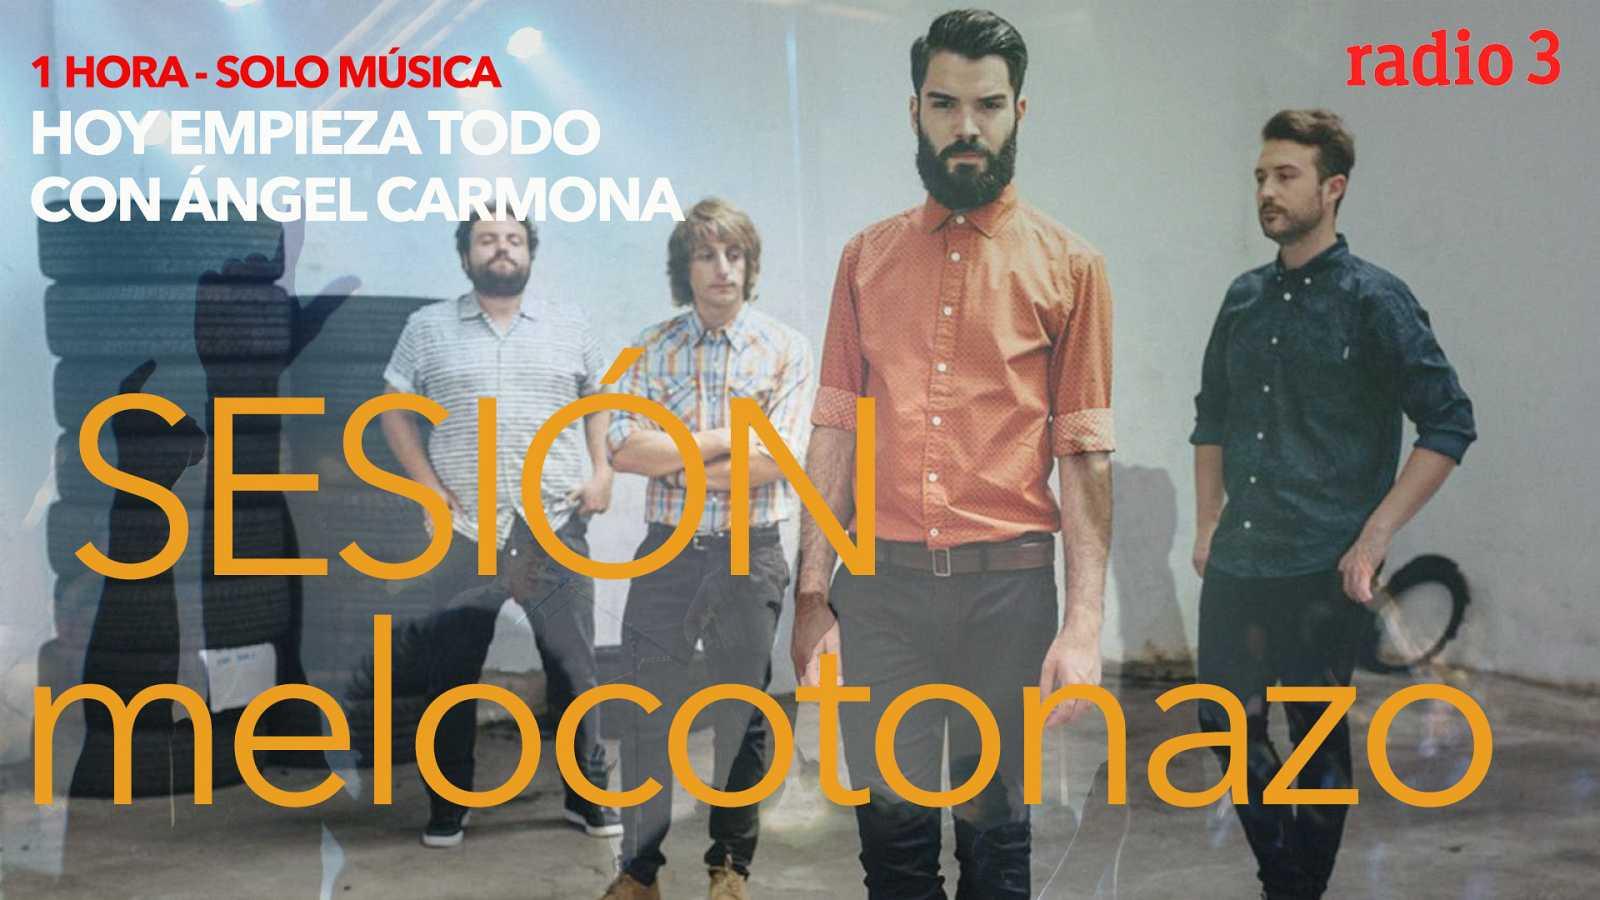 Hoy empieza todo con Ángel Carmona - #SesiónMelocotonazo: Vinicius de Moraes, Supersubmarina, Carolina Durante... - 19/10/20 - escuchar ahora